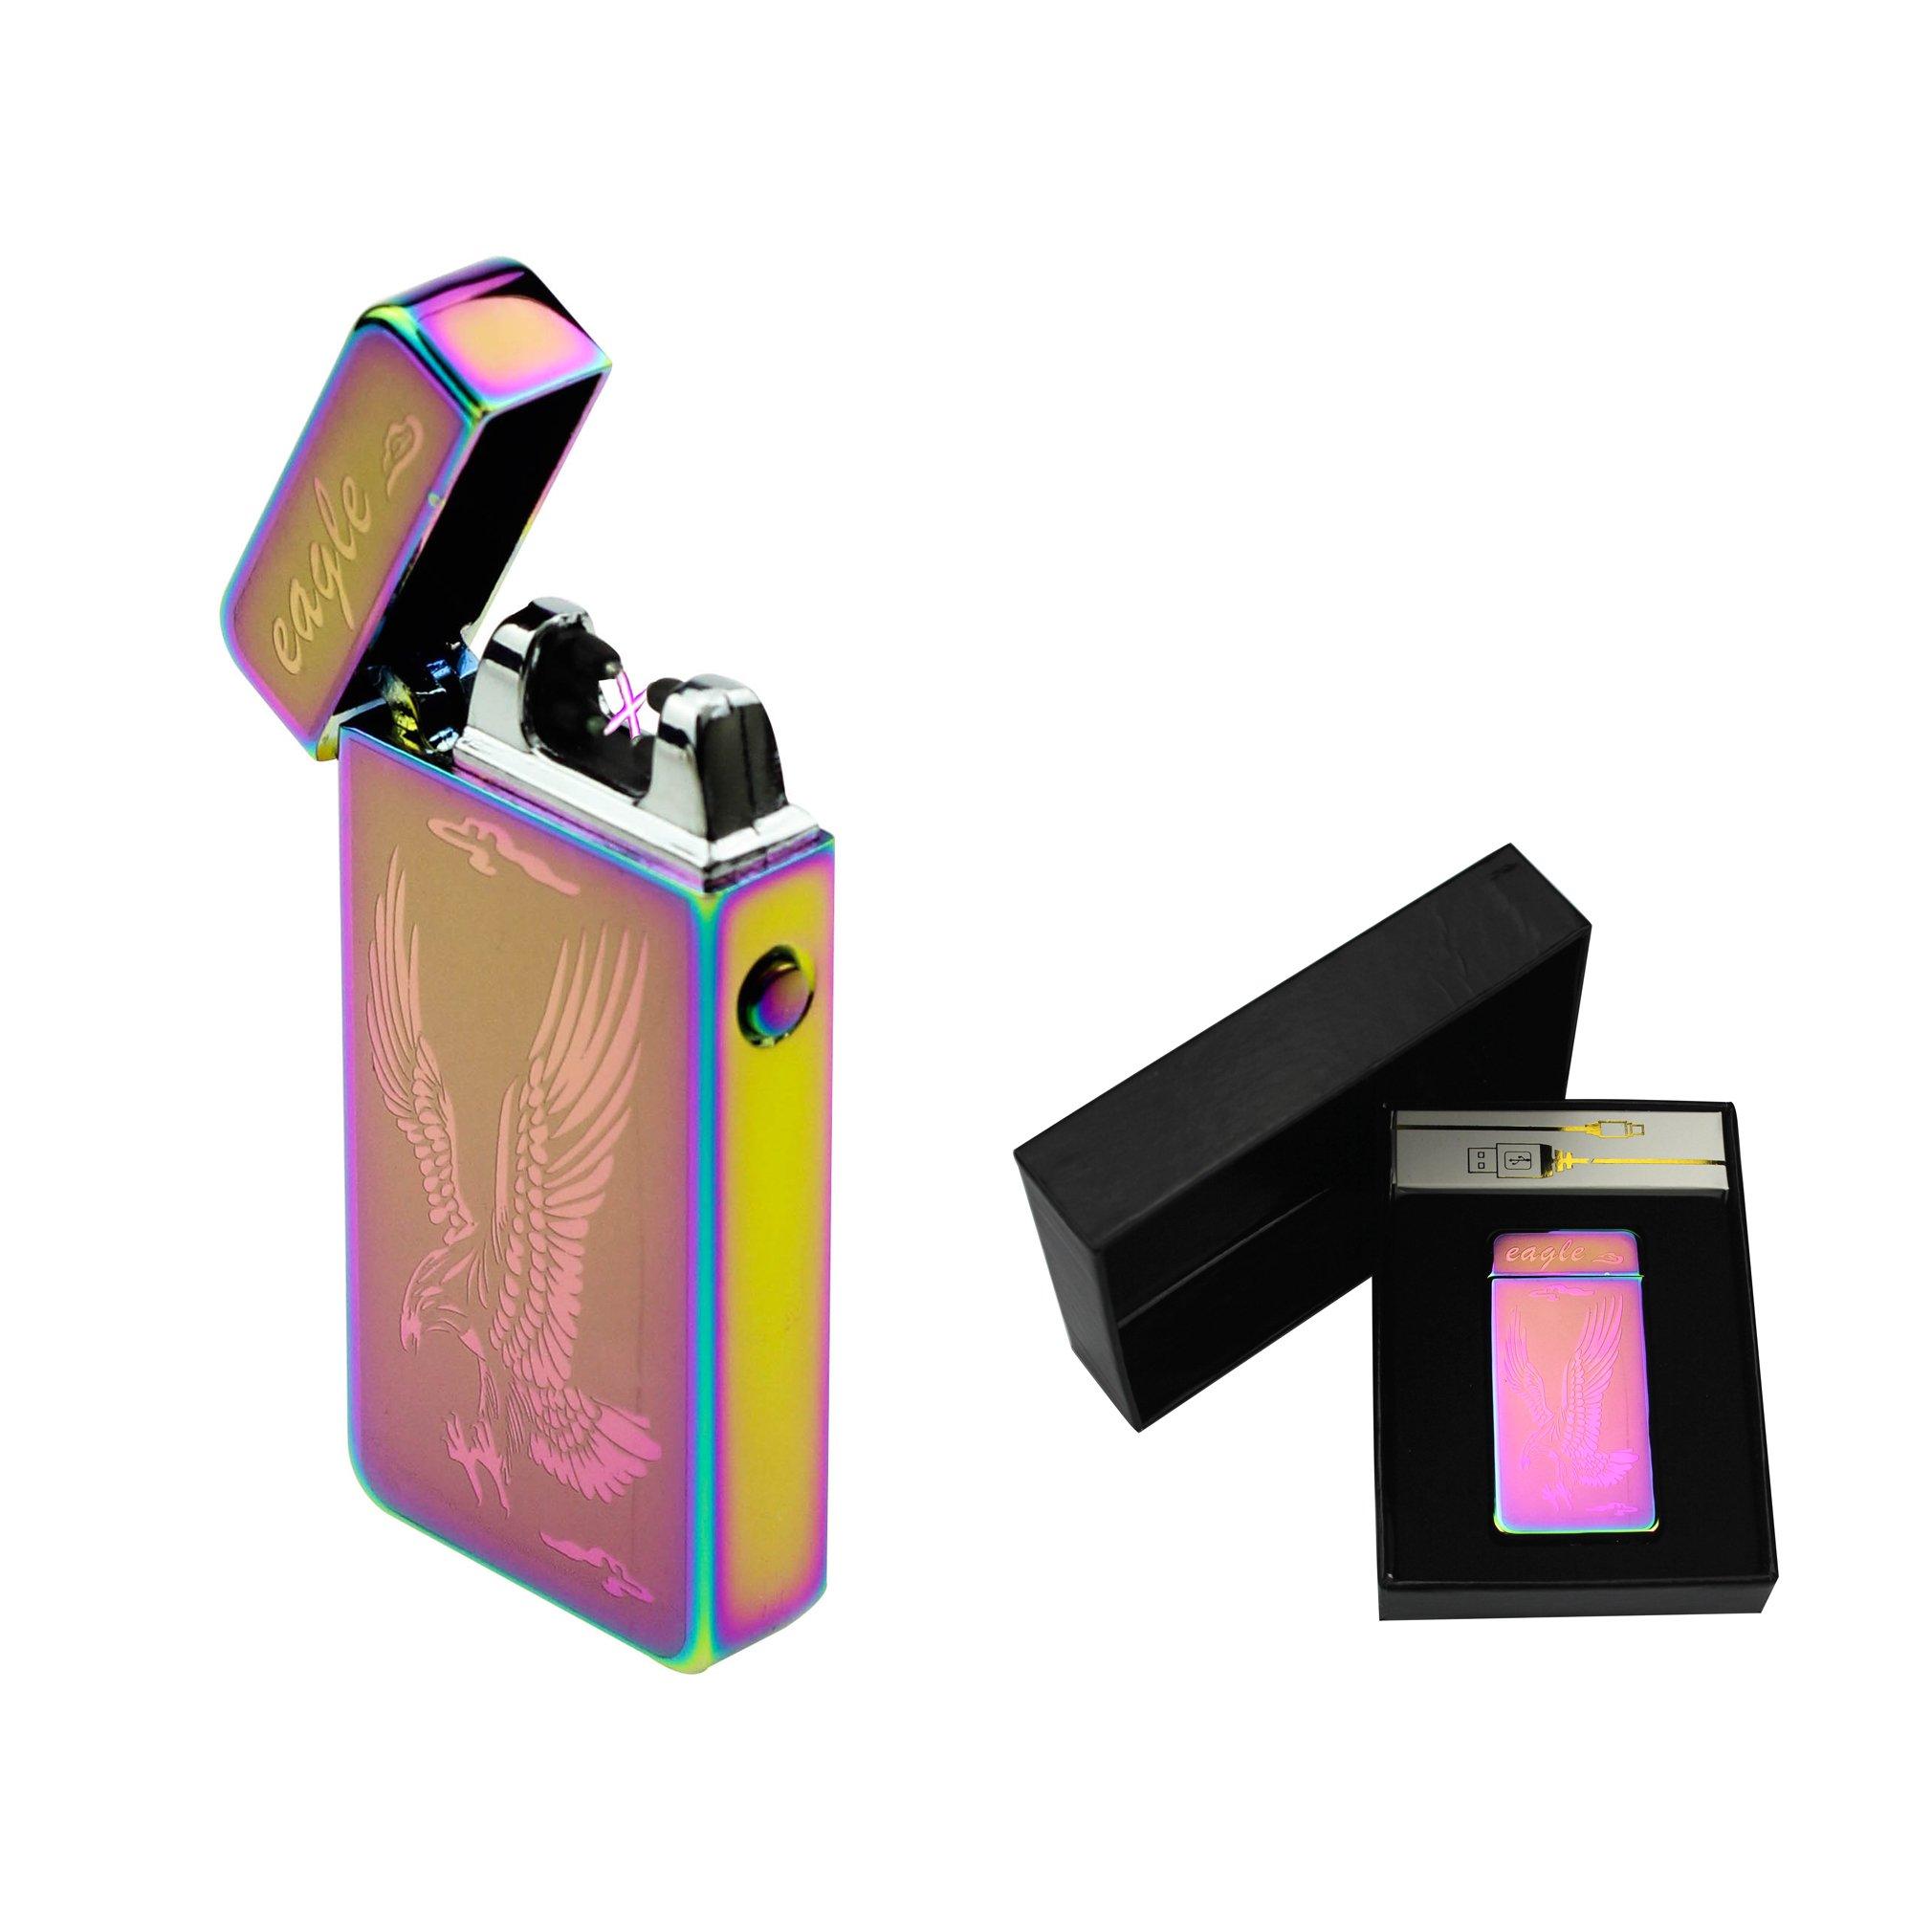 Sunshine USB Lighter Dual Arcs Flameless Windproof Wider Arcs Plasma Beam Dual Arc Lighter USB cable included (Rainbow Eagle) by Sunshine (Image #1)